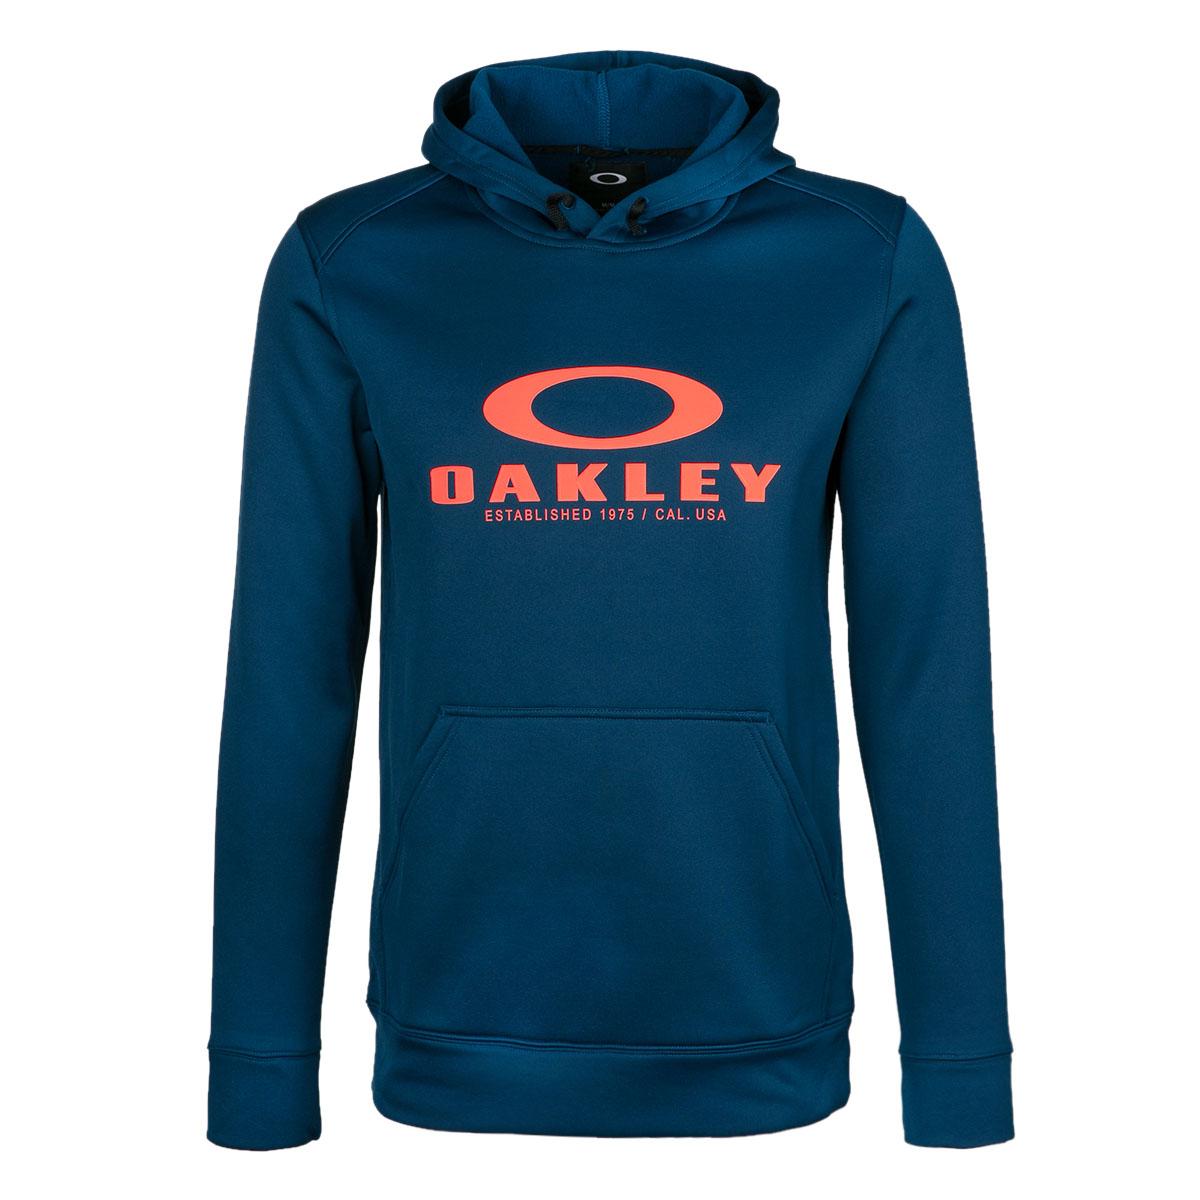 Oakley Fleece Hoody 360 Poseidon | Maciag Offroad